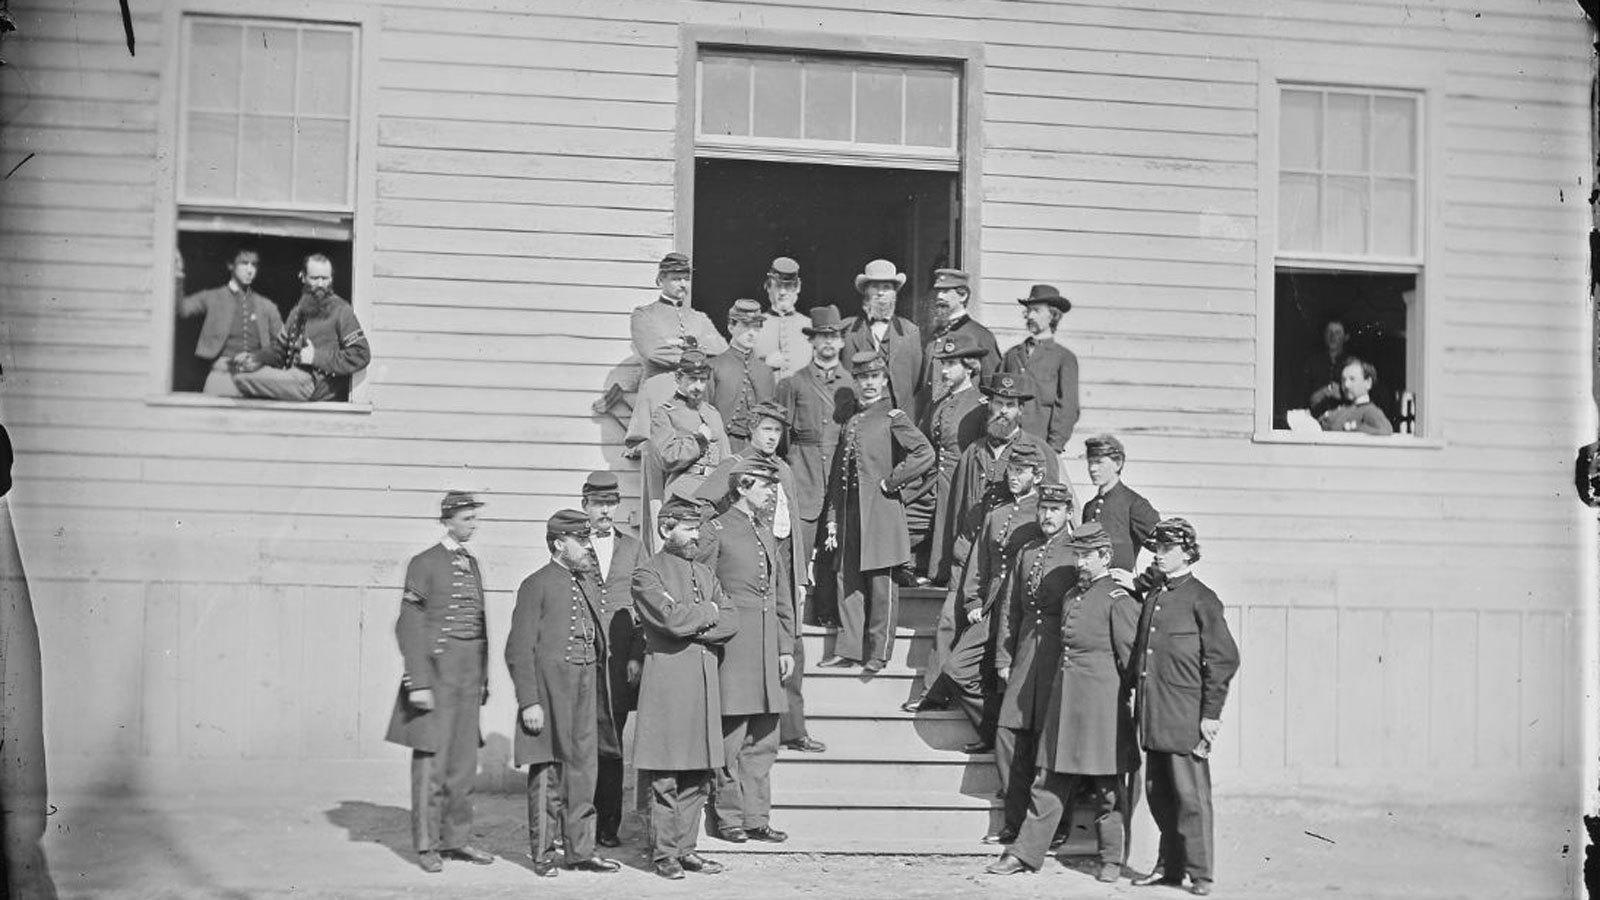 Civil War surgeons and stewards at Washington's Harewood hospital, circa 1860-65. (U.S. War Department)